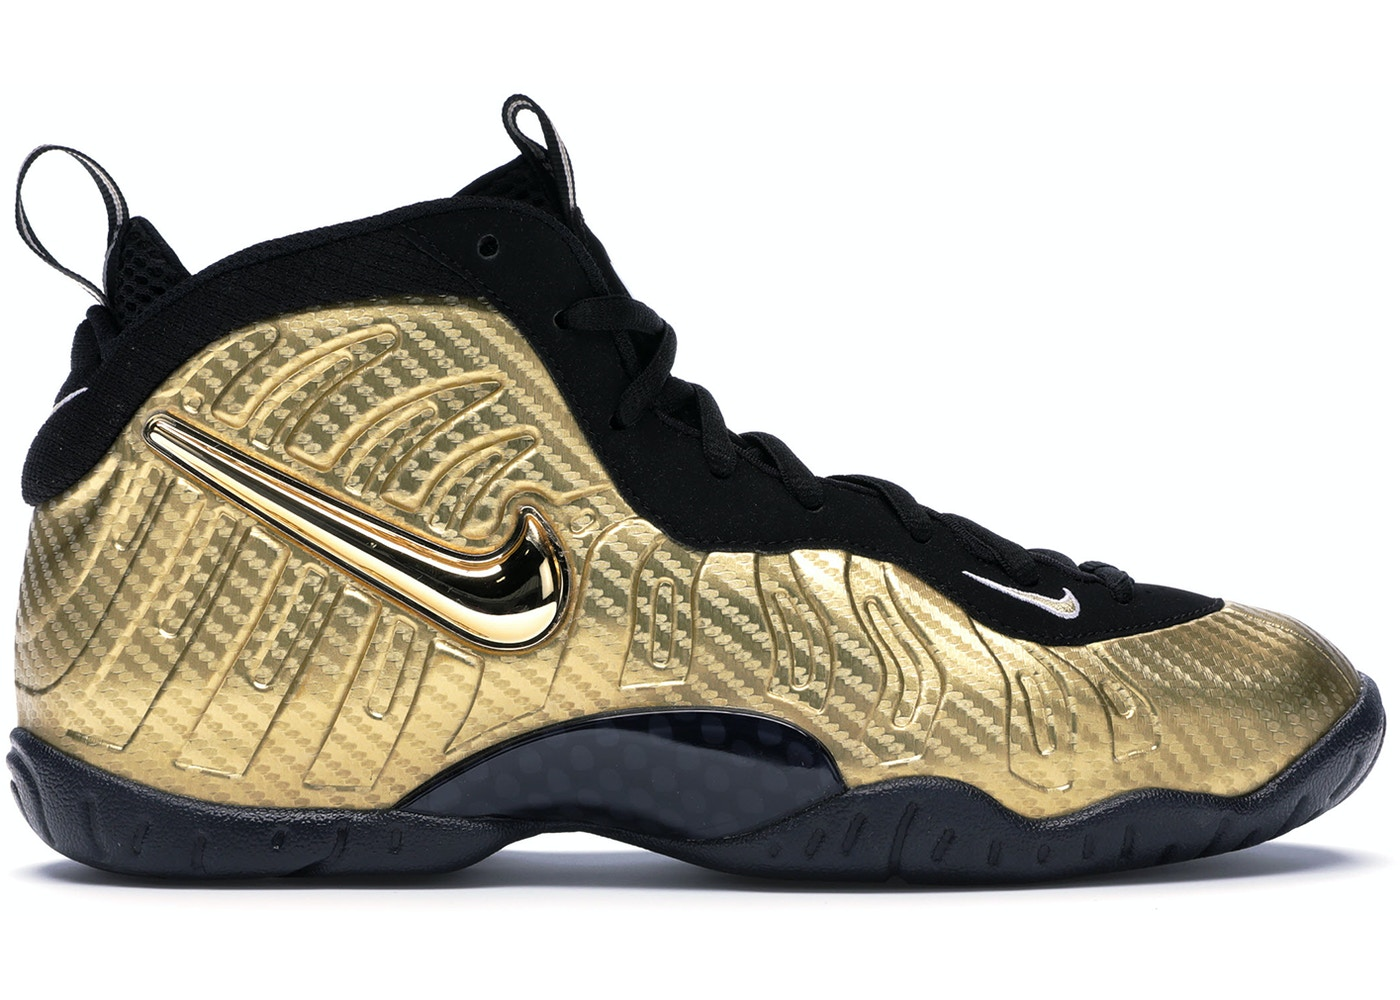 e4aa363cb34 Air Nike Foamposite Pro Metallic Gold (GS) - 644792-701